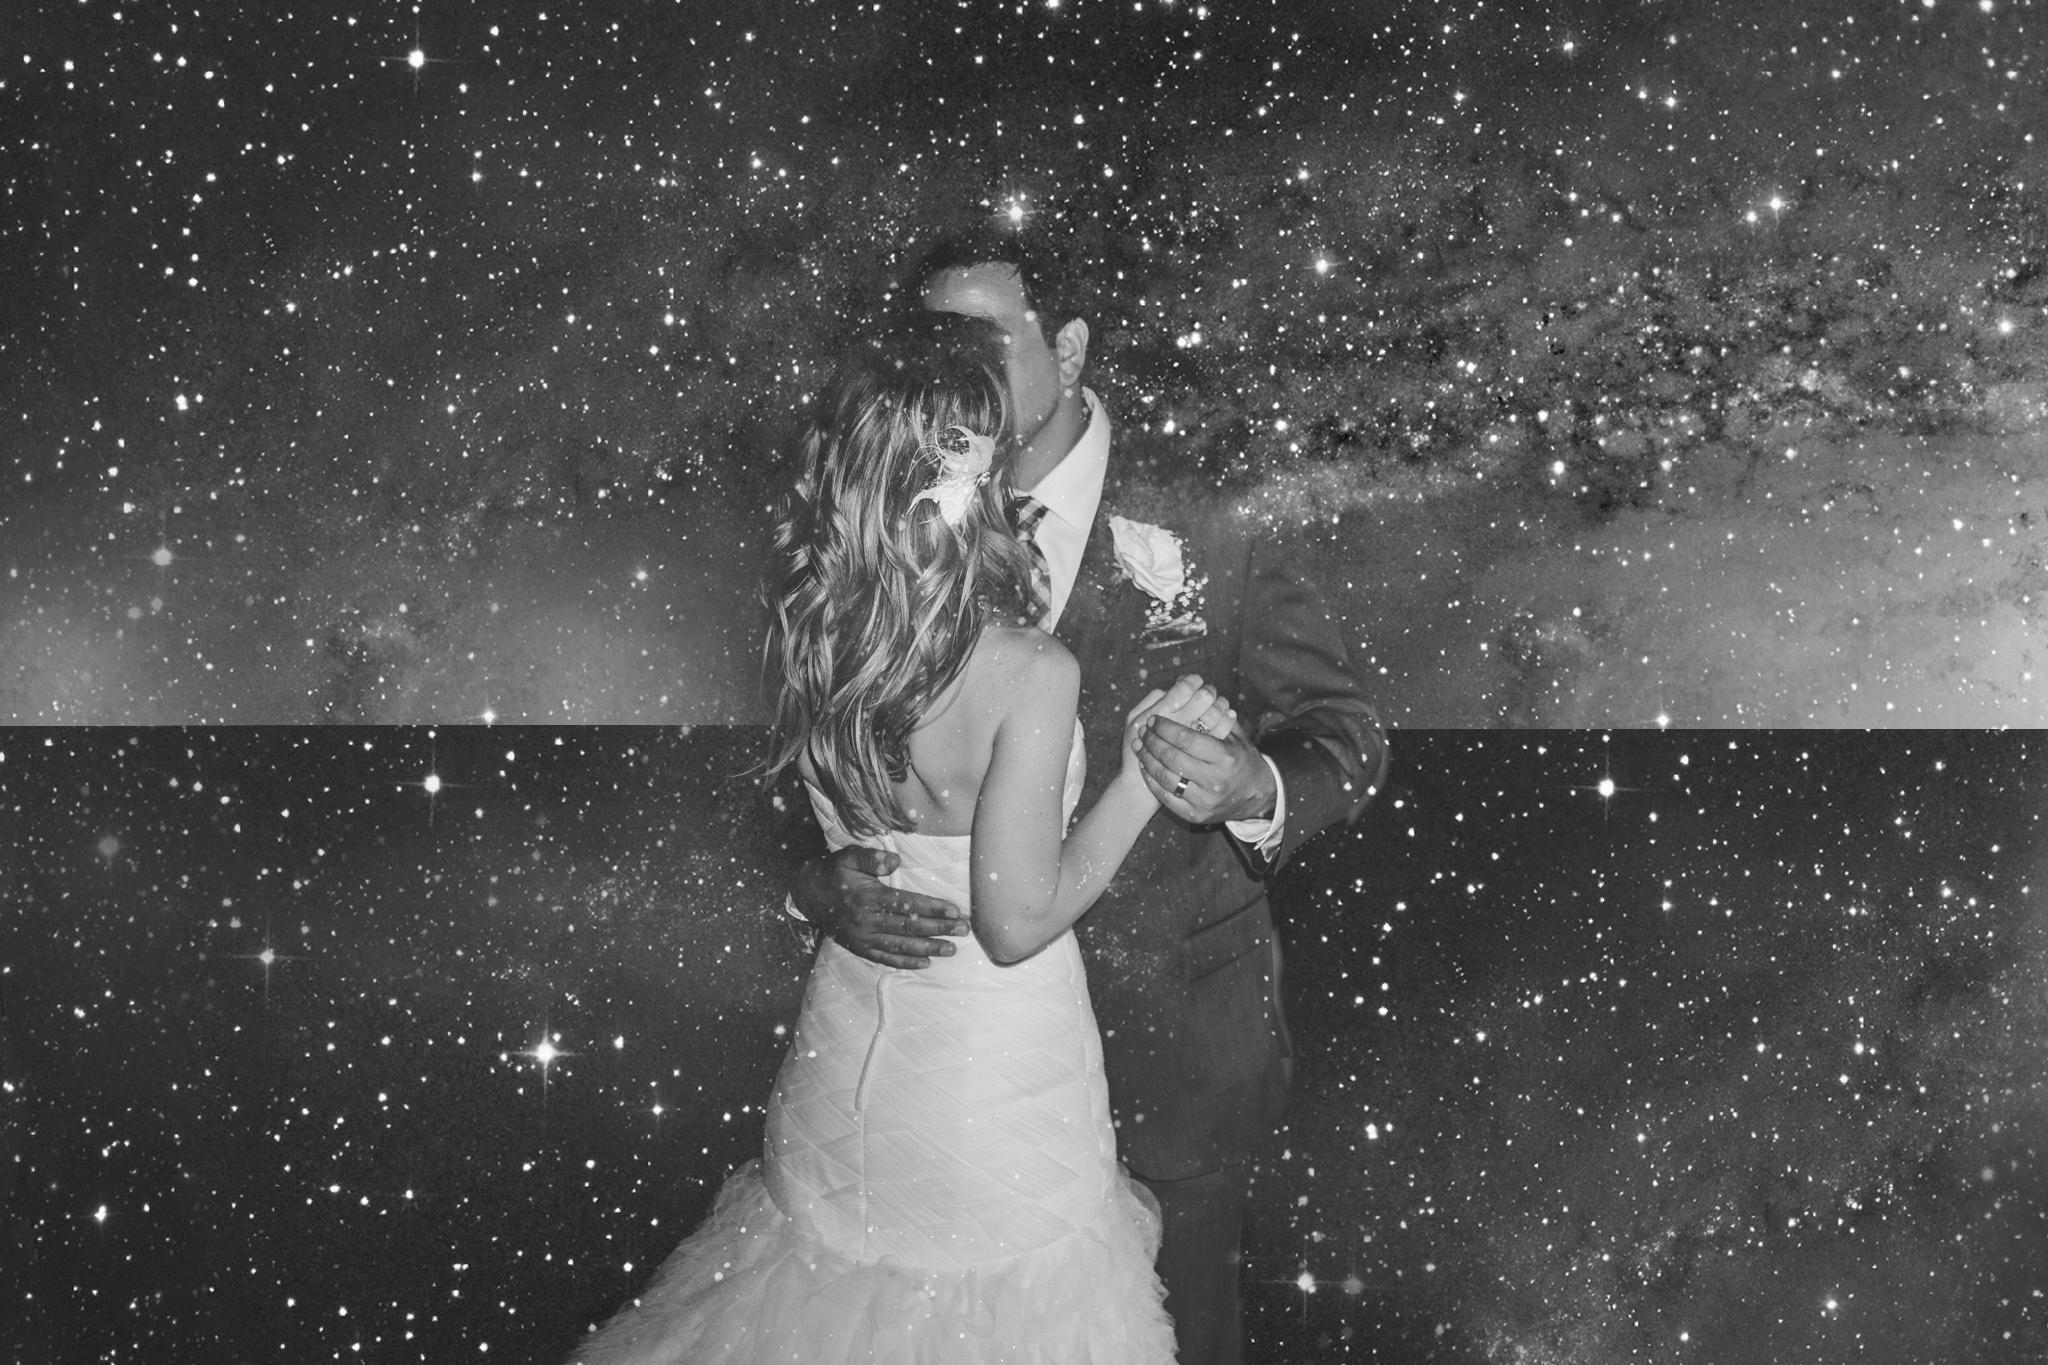 phoenix-ax-wedding-photographer-aaron-kes-bride-groom-first-dance-stars